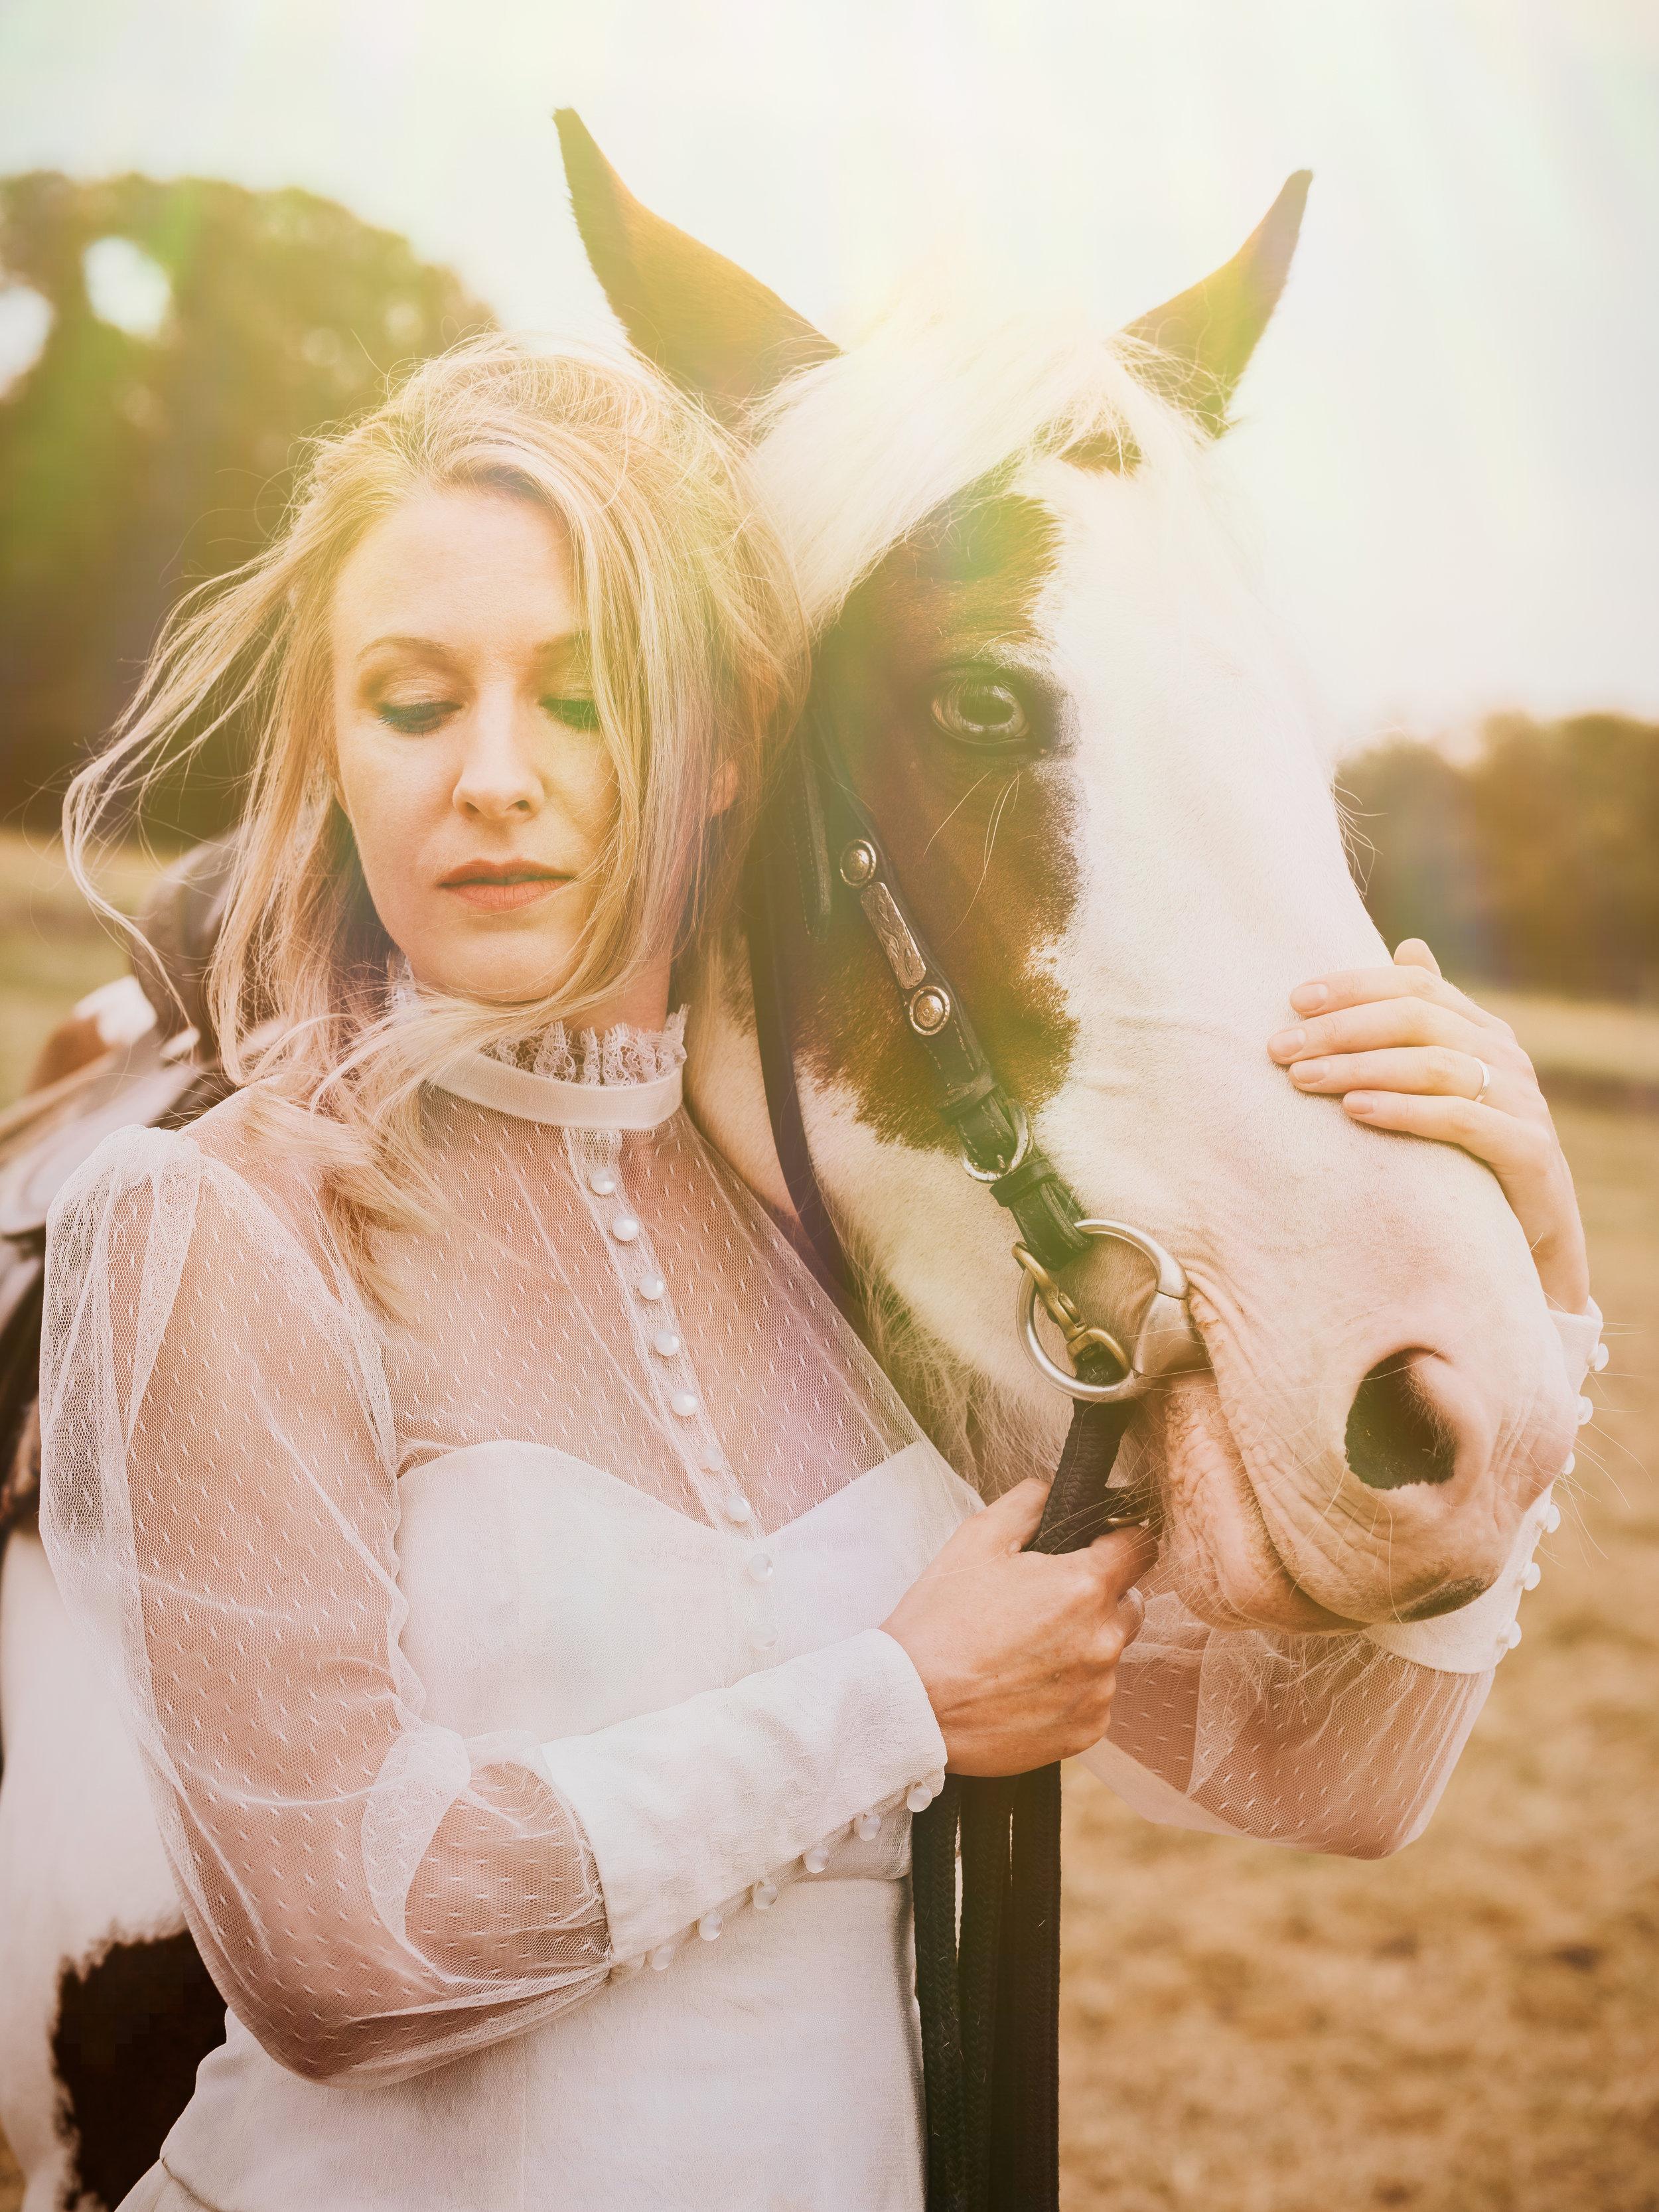 Jessica-Milberg-Photography-Brighton-London-Wedding-Fashion-Photographer-Creative-Wedding-Dress-12.jpg